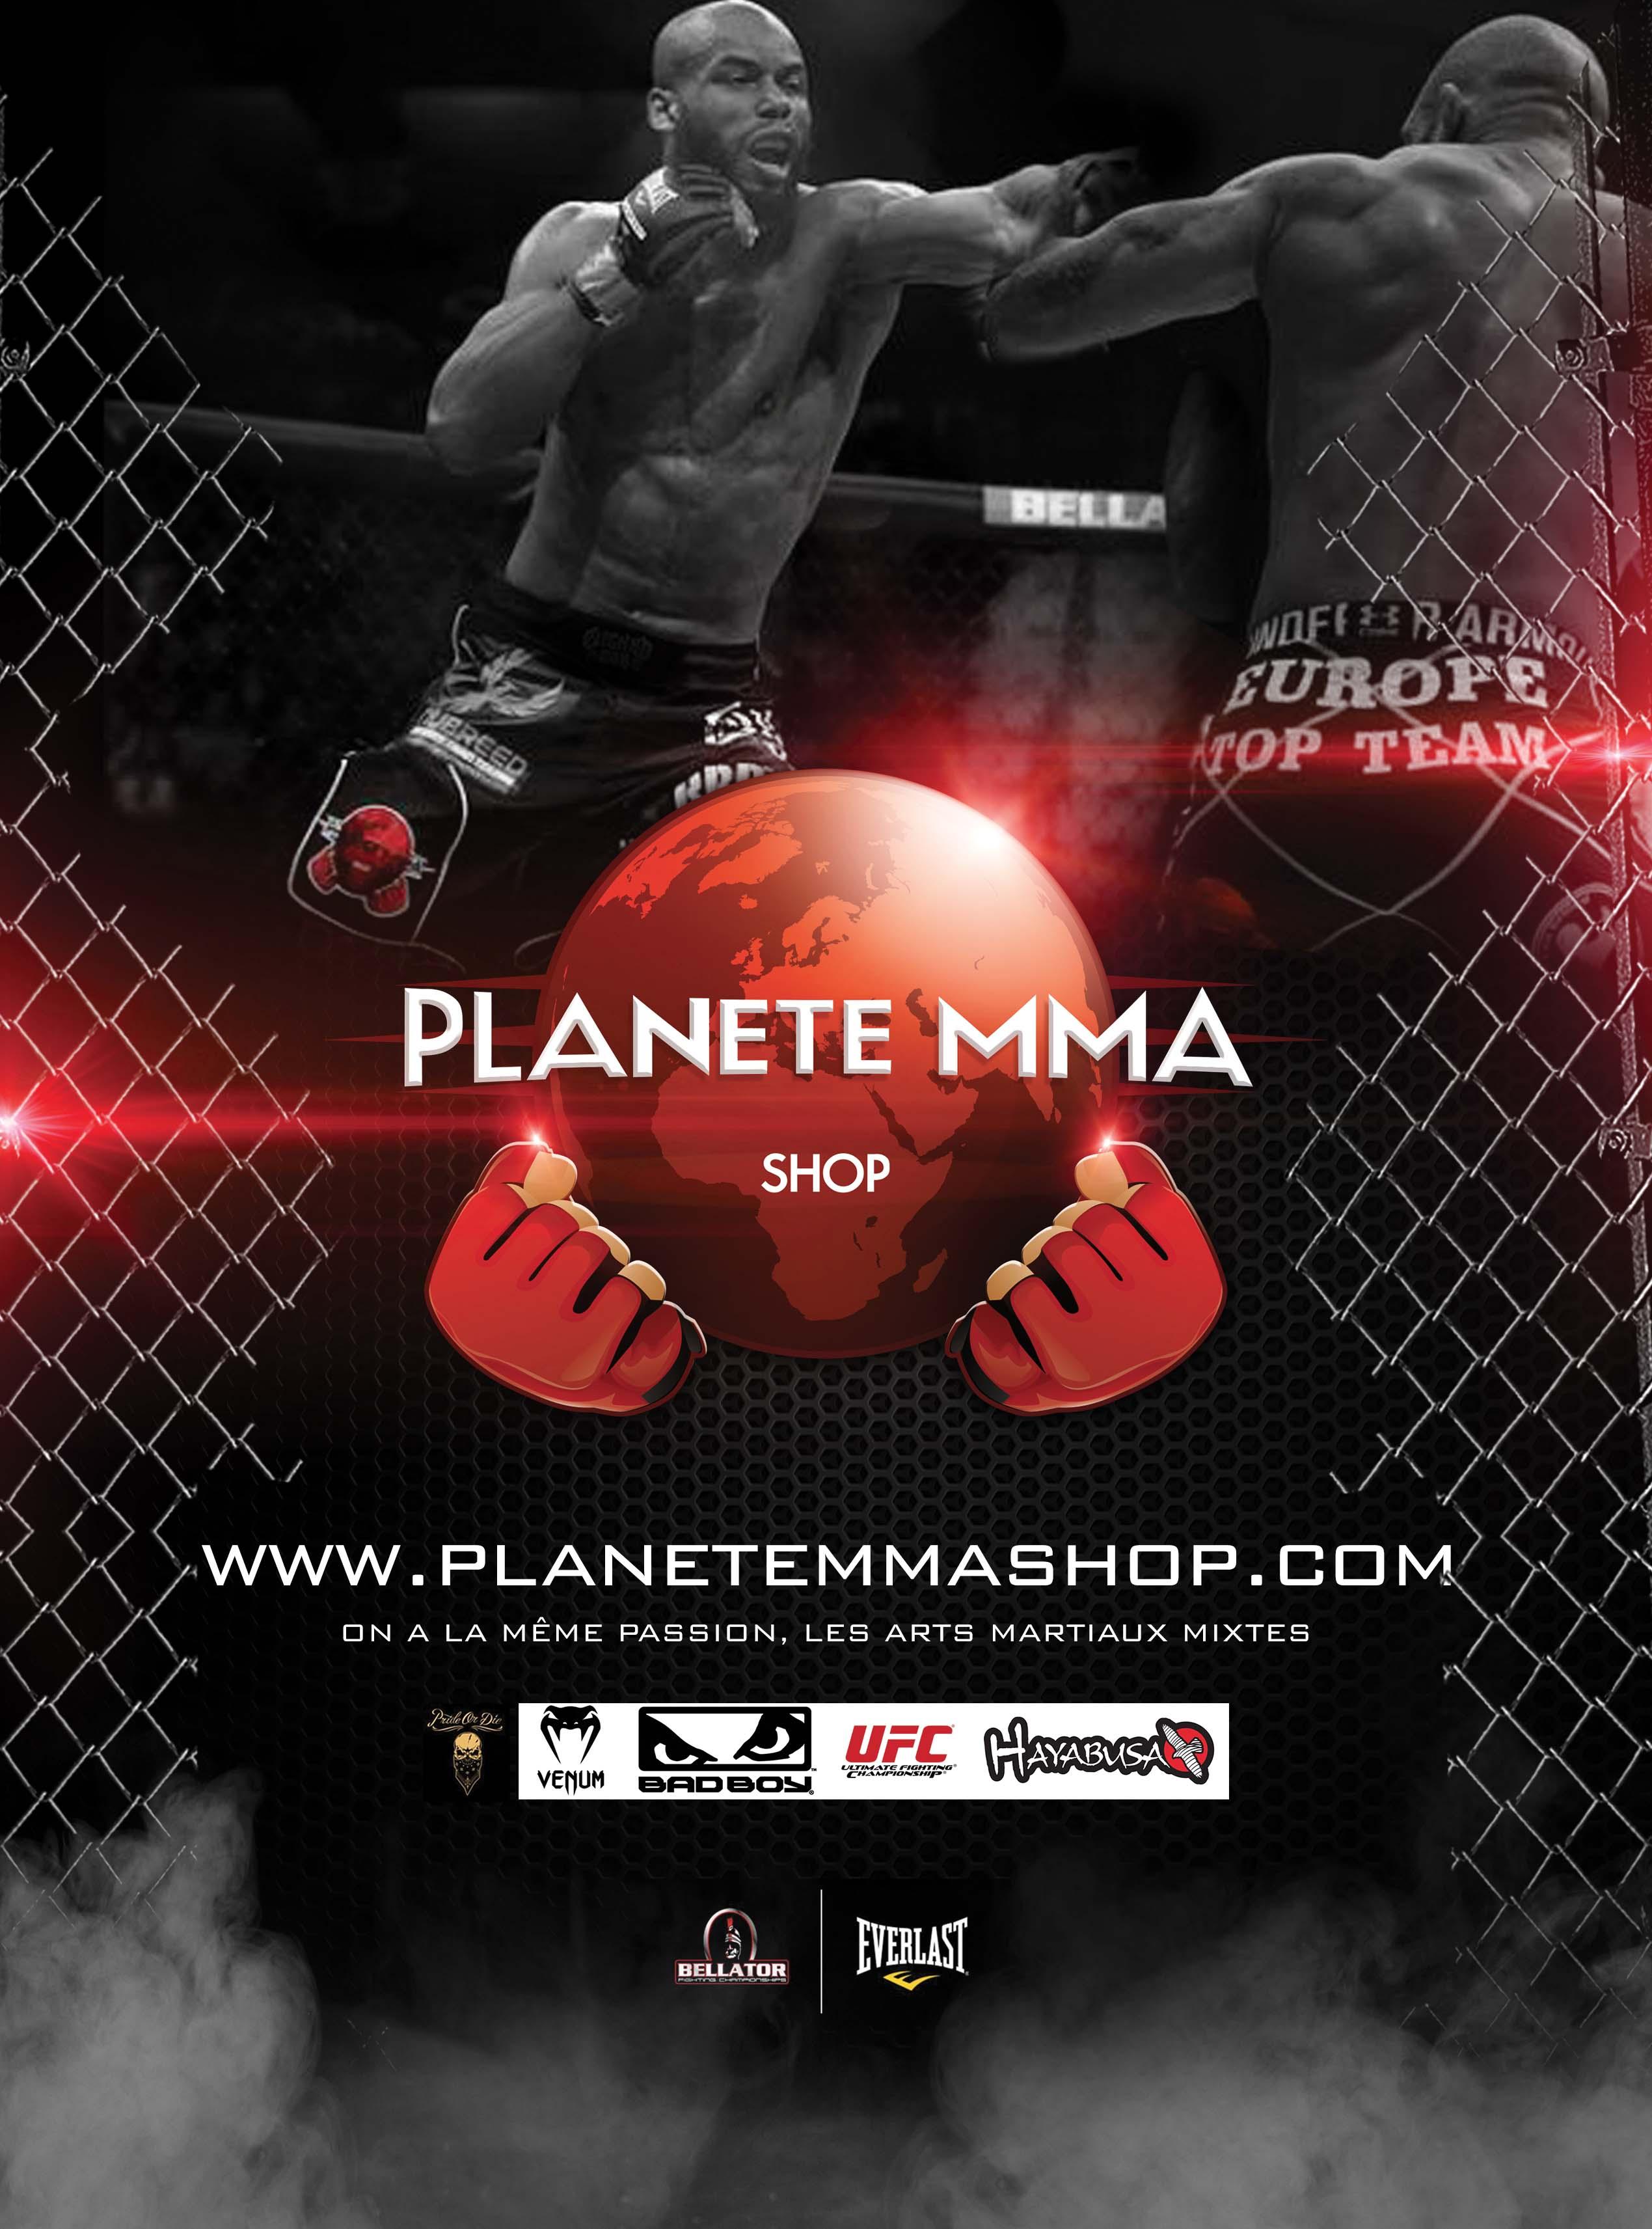 affiche-web-pmashhop-magfightsport